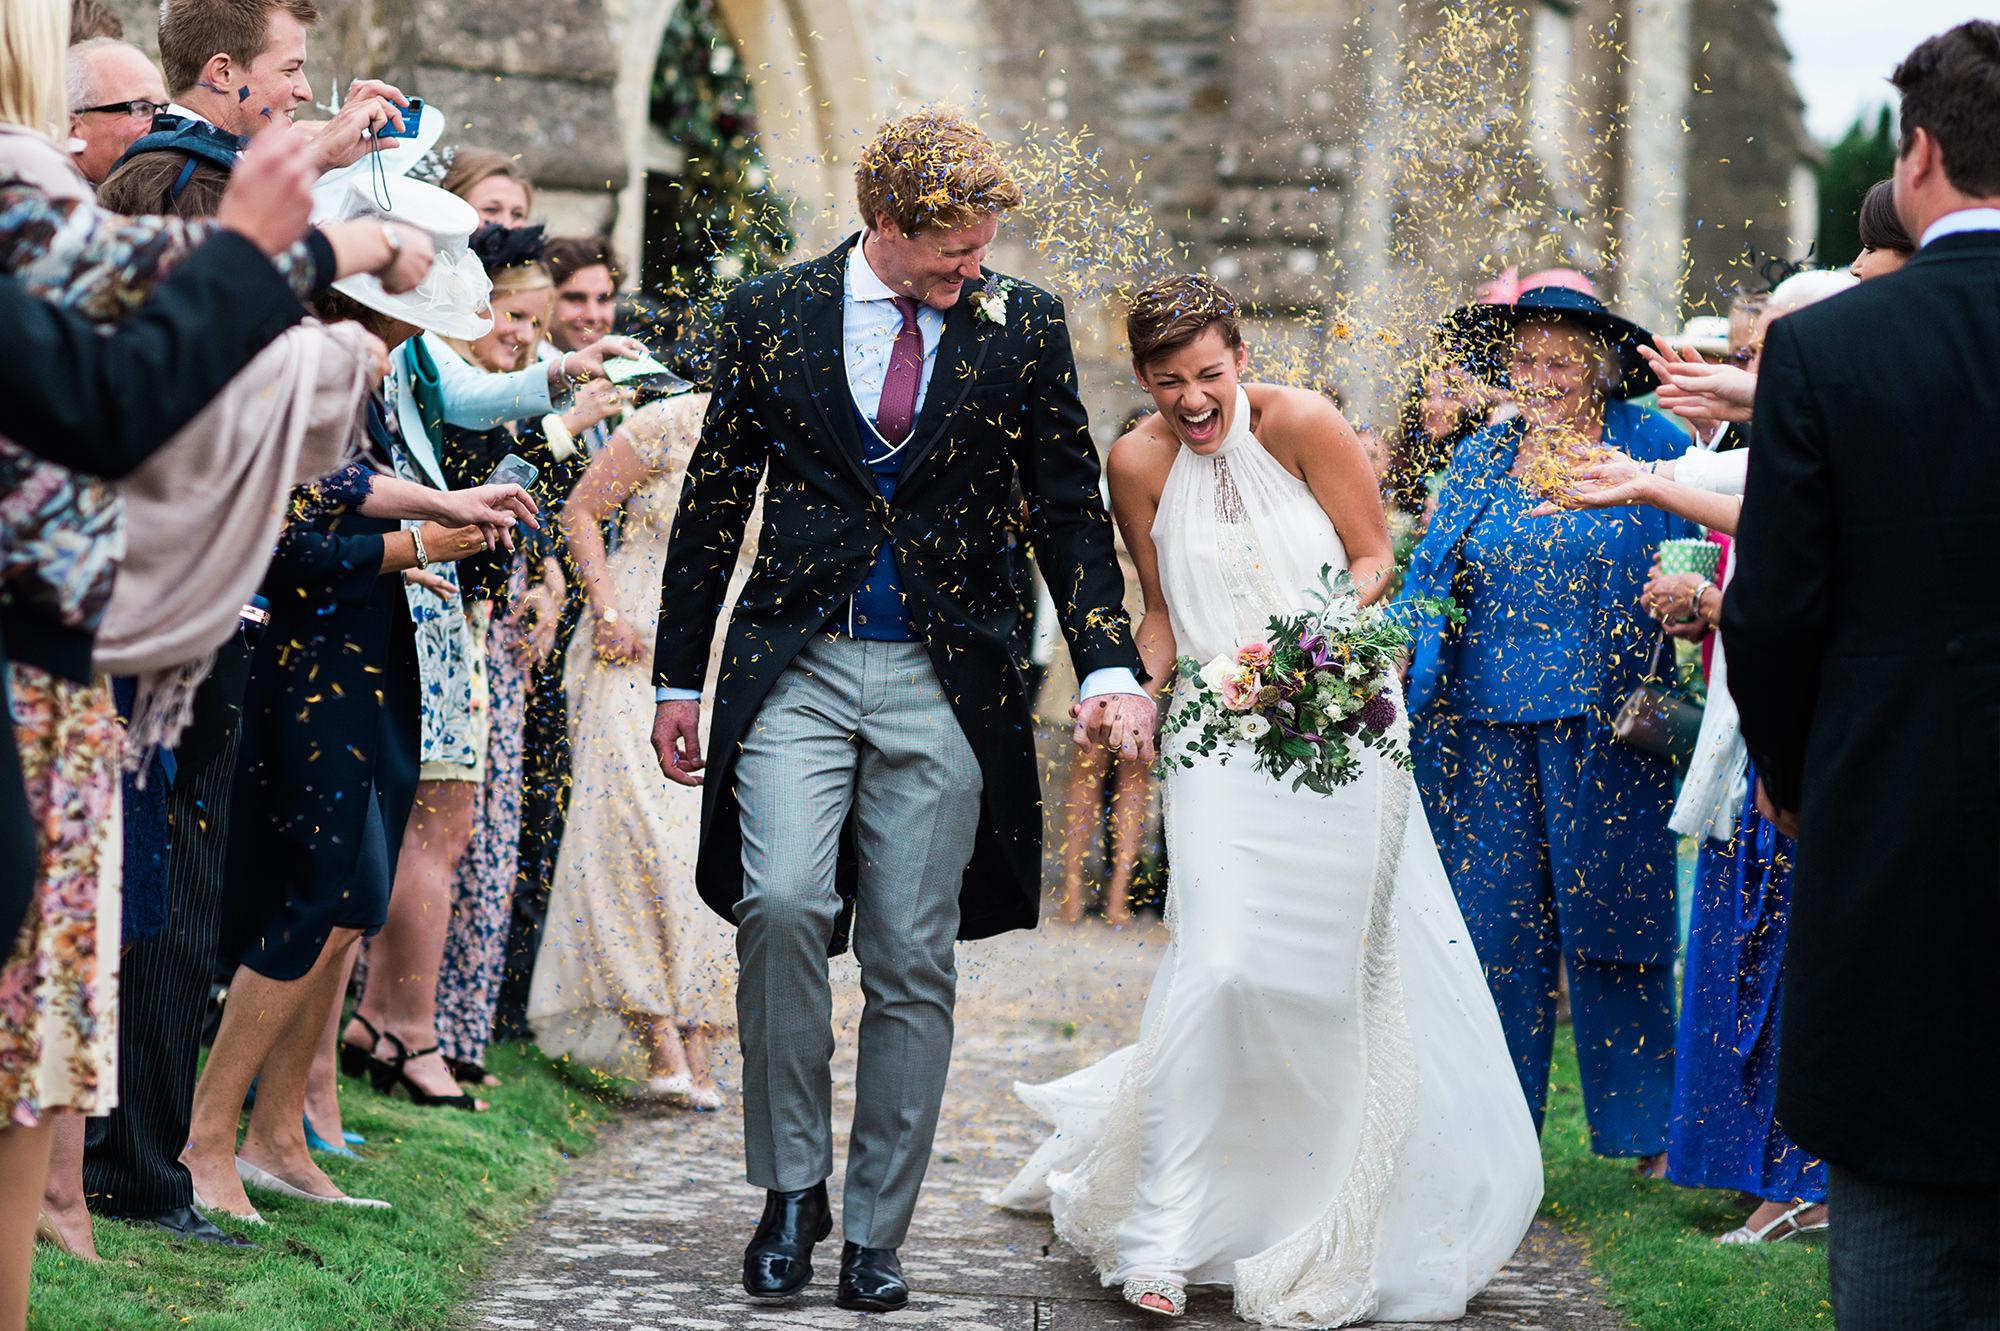 Simon biffen-best of 2015 wedding photographs-03